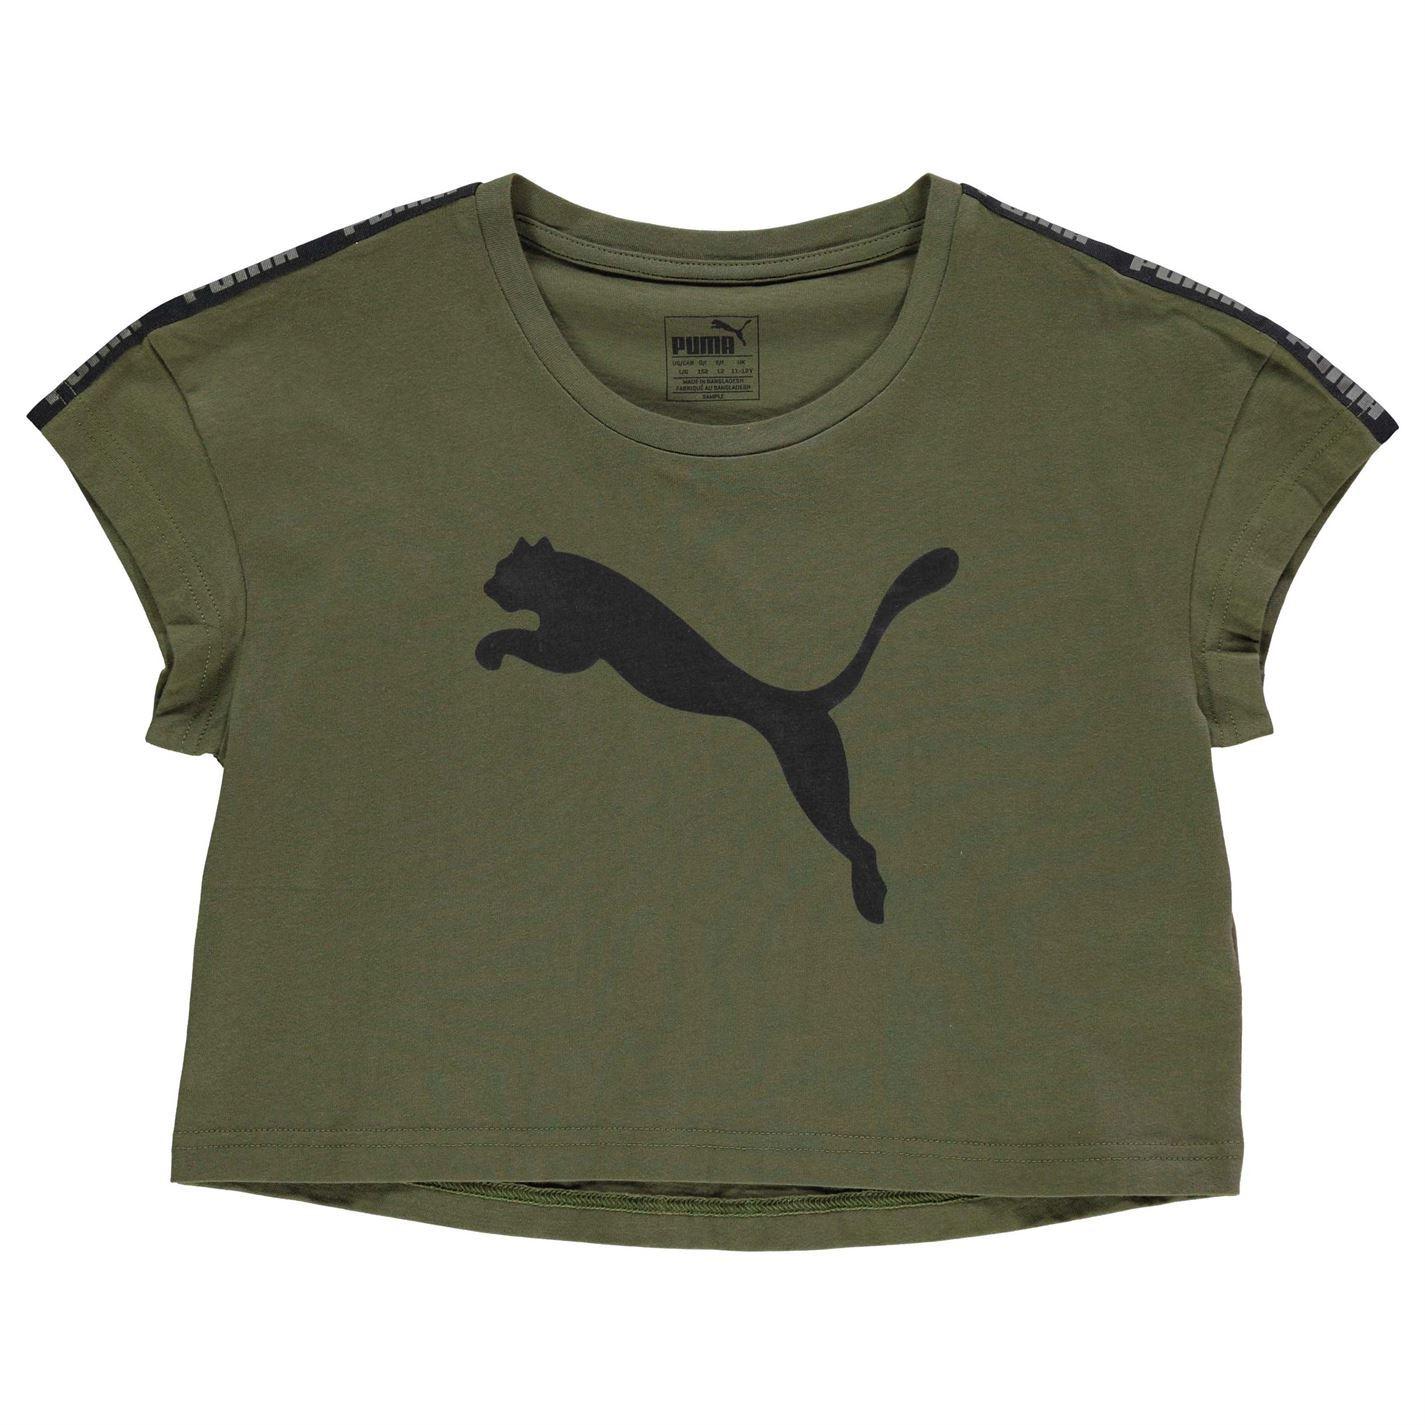 Puma Kids Girls Tape Crop Leisure T Shirt Junior Crew Neck Tee Top ... 02aca12ea4